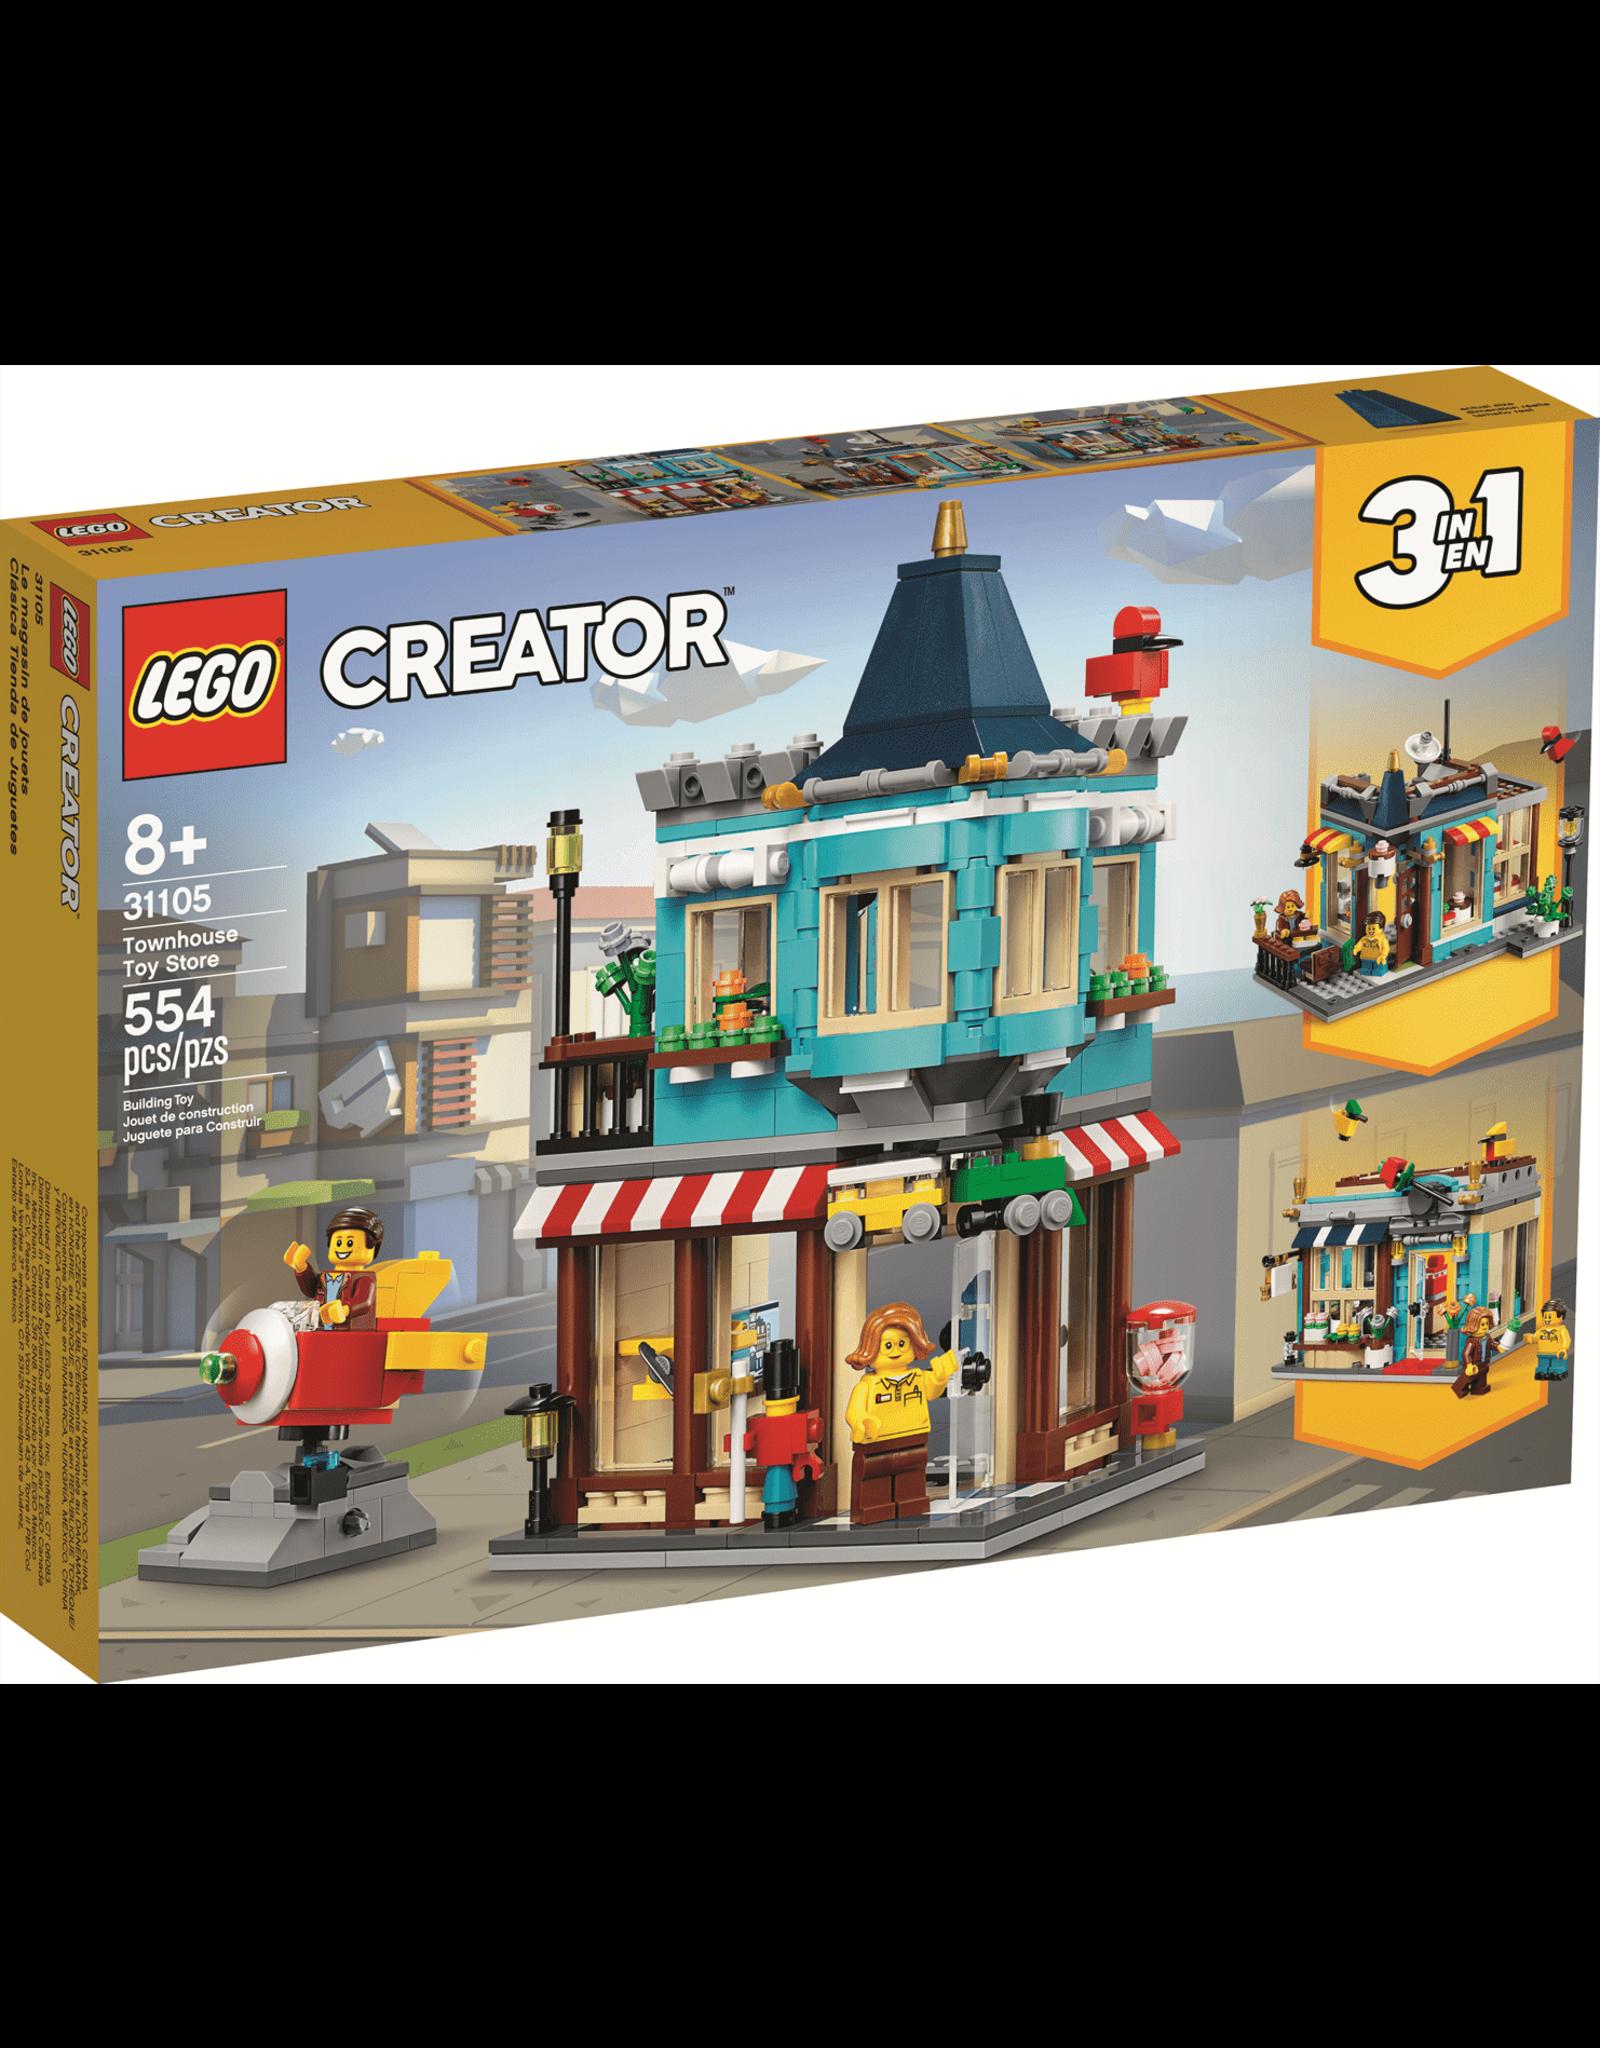 Lego Creator Townhouse